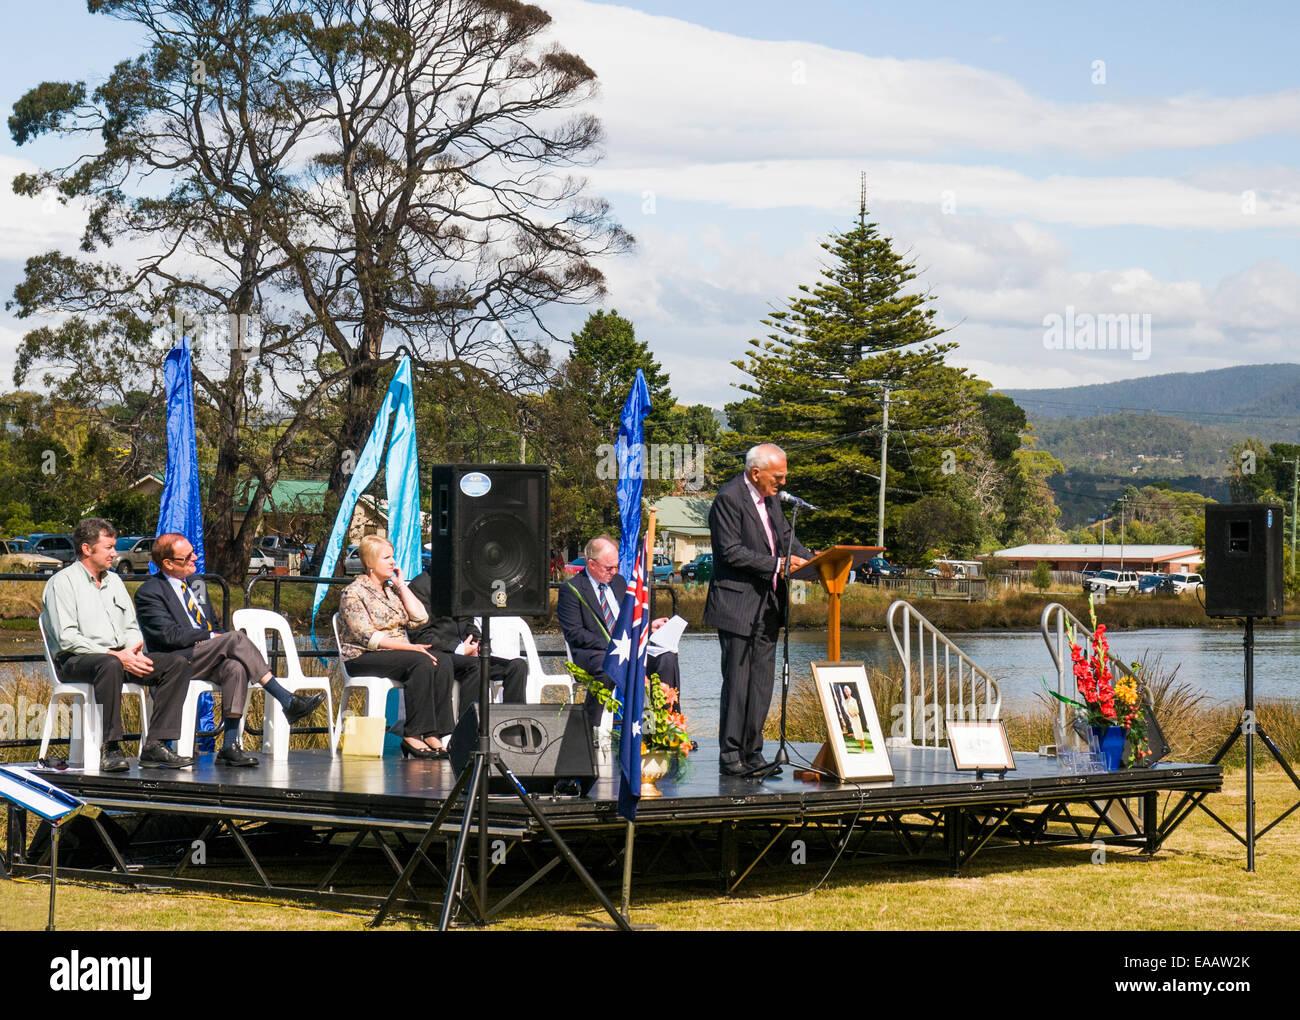 Local dignitary speaking at an Australian citizenship ceremony on Australia Day in Kingston, Tasmania - Stock Image